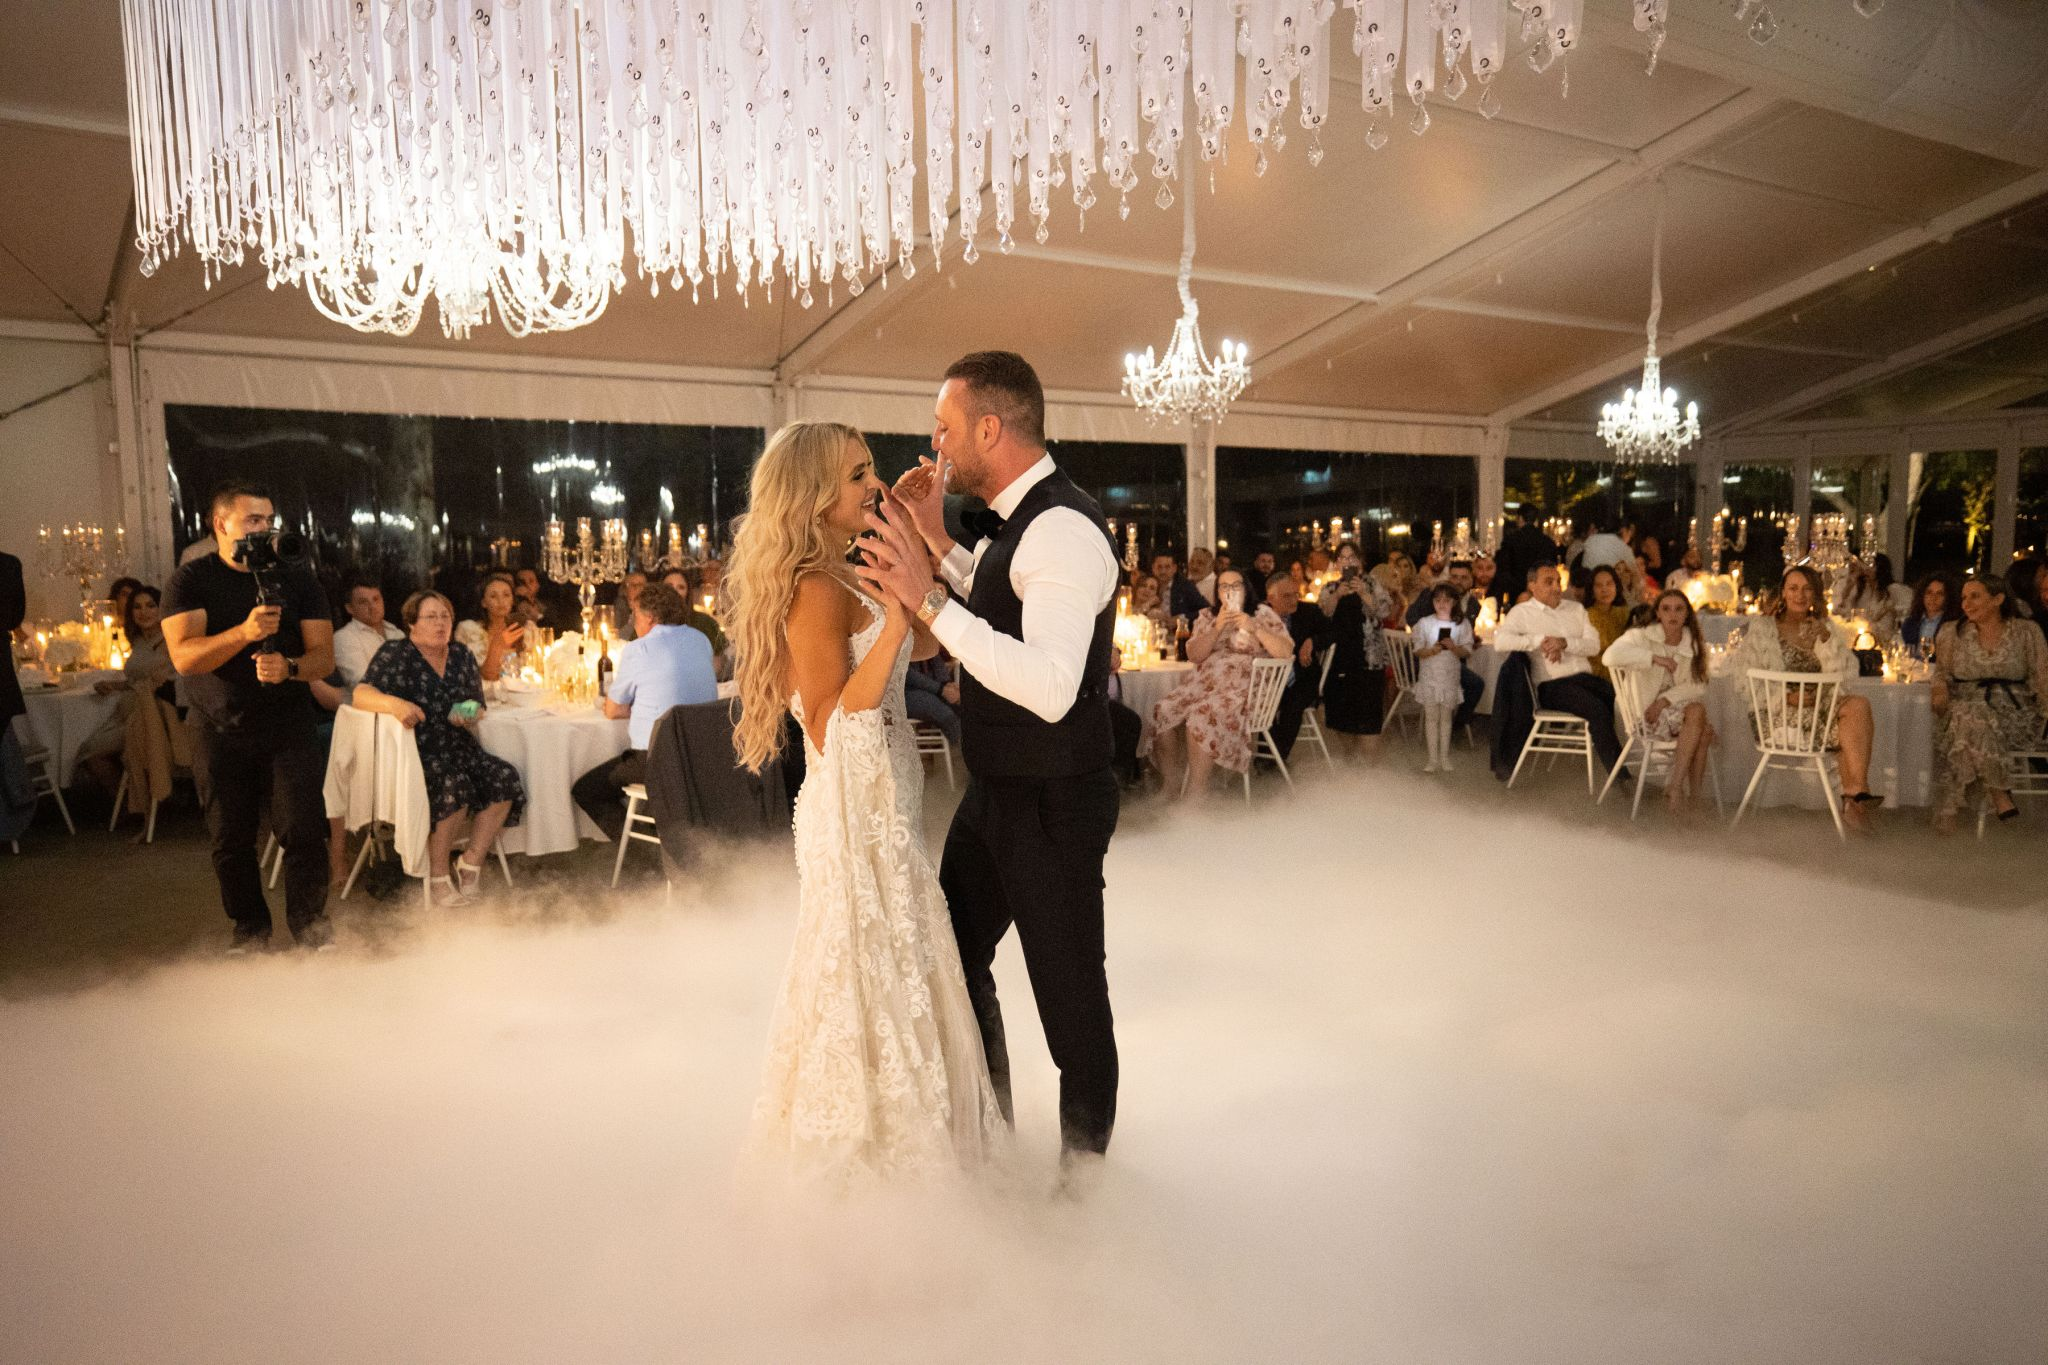 Wedding Dry Ice Adelaide